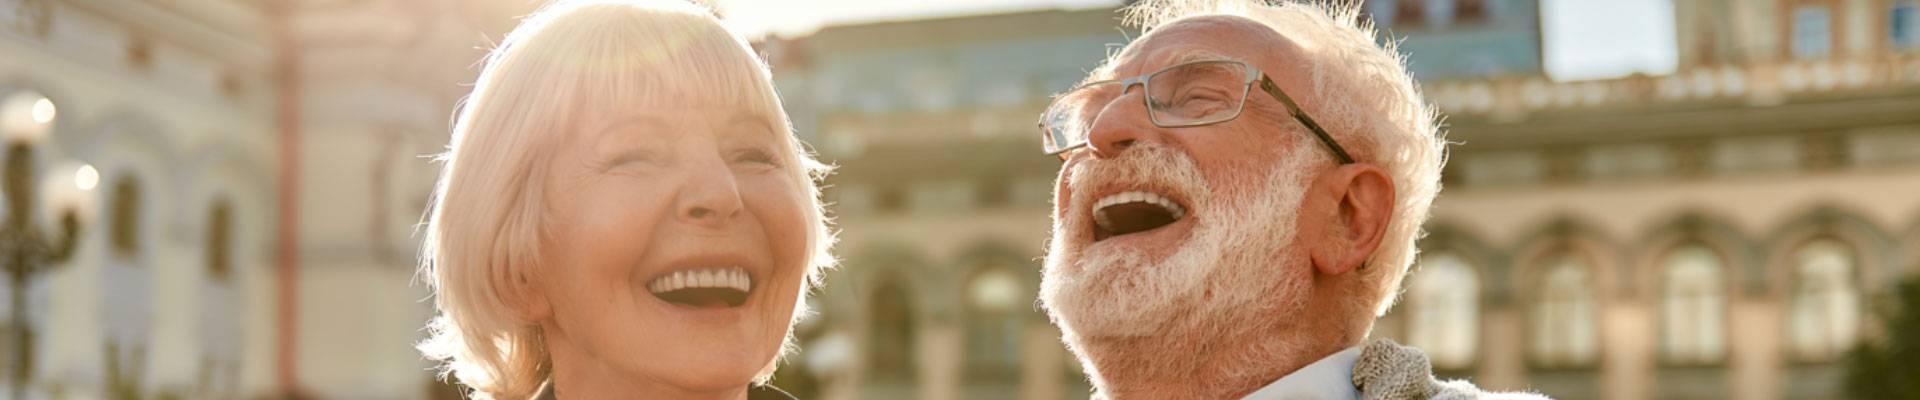 Chaussons Confort + PharmaConfort en Pharmacie